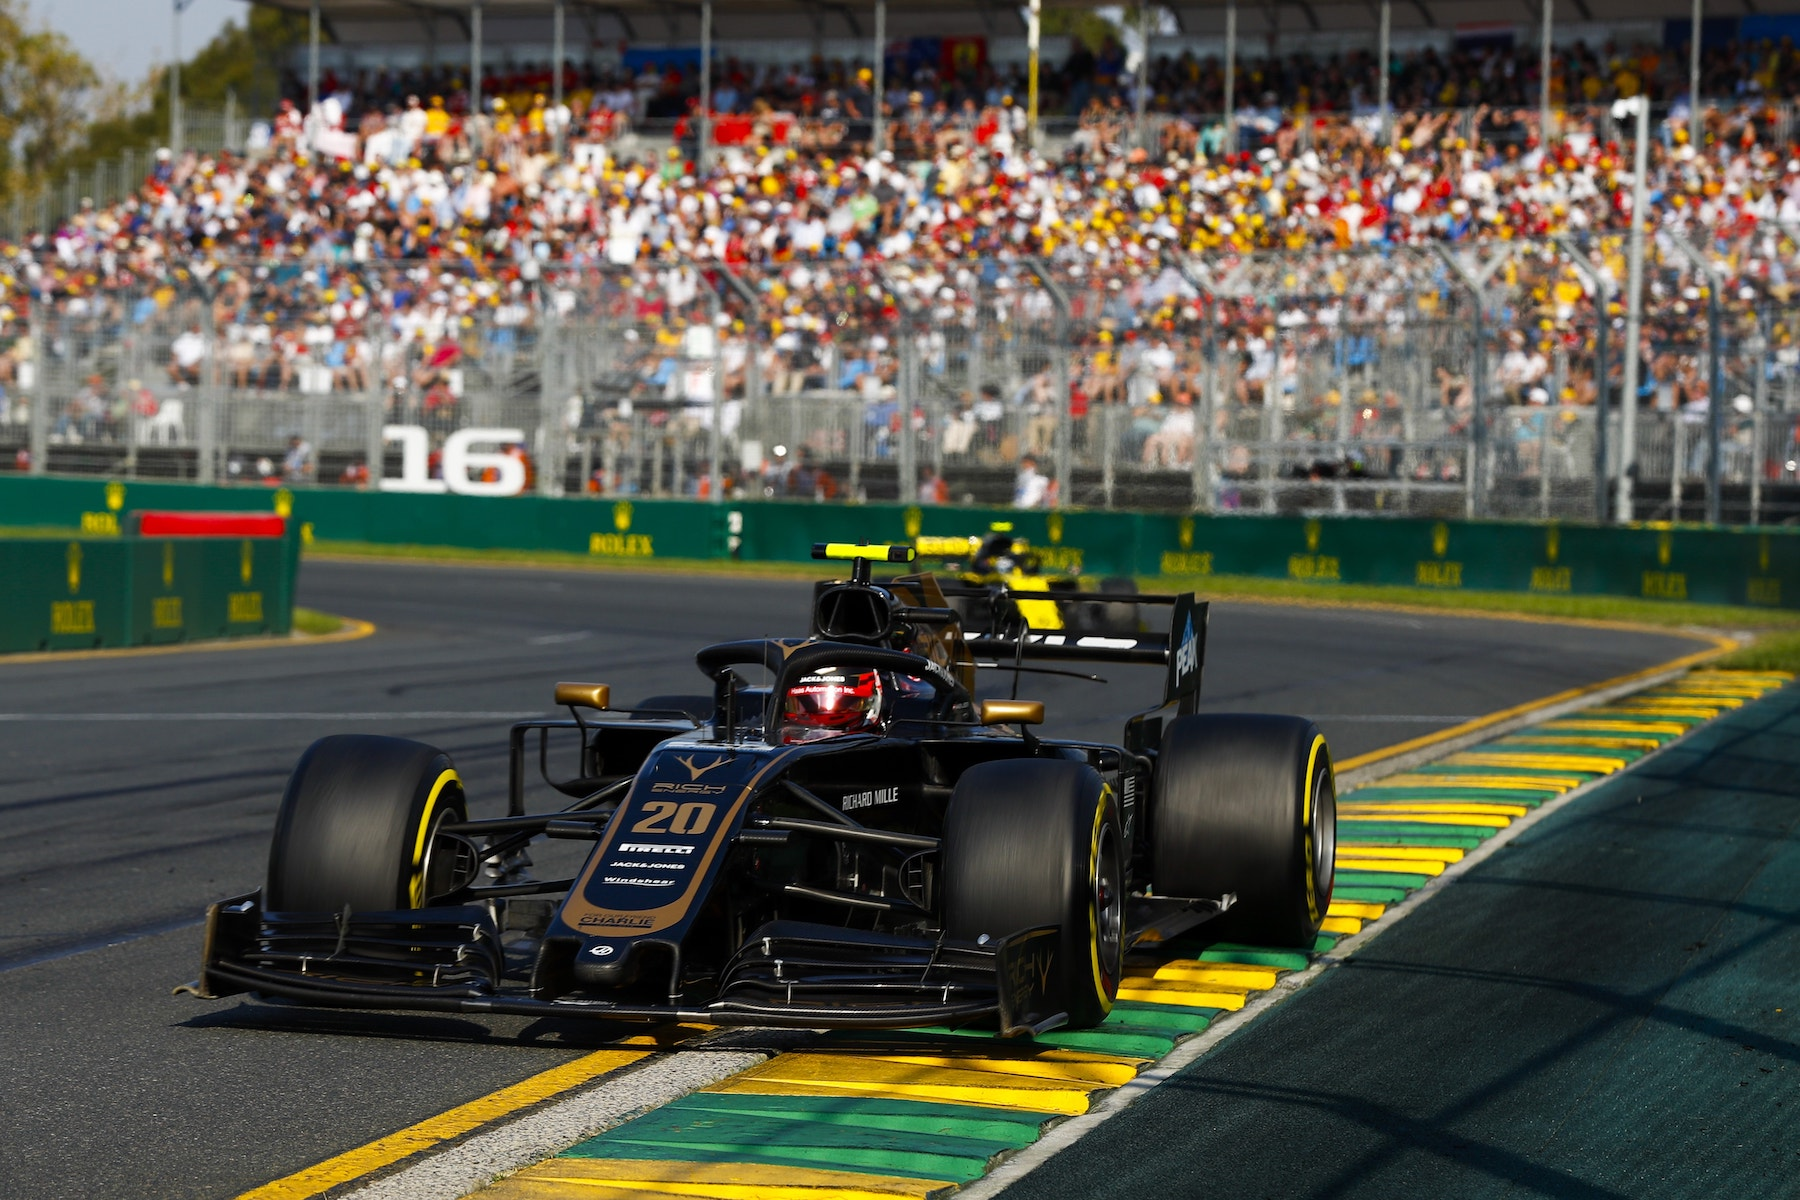 G 2019 Kevin Magnussen | Haas VF19 | 2019 Australian GP P6 1 copy.jpg